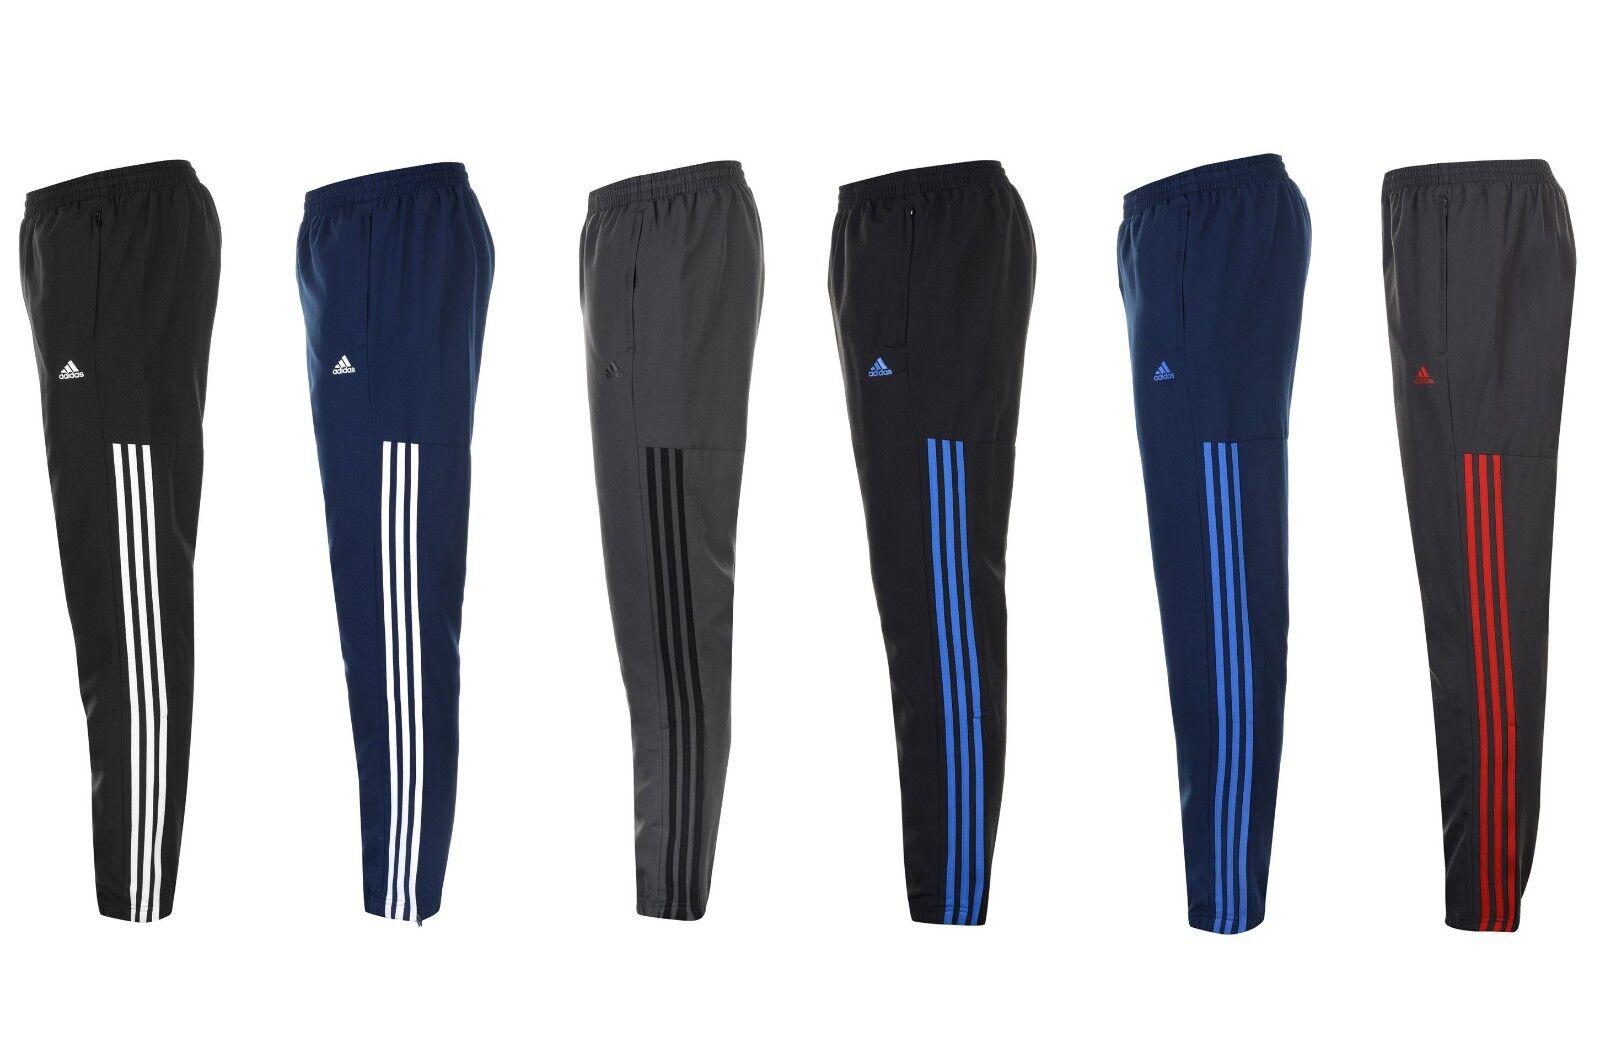 Adidas Herren Trainingshose Fußballhose Jogginghose Sweat Hose S M L XL XXL NEU